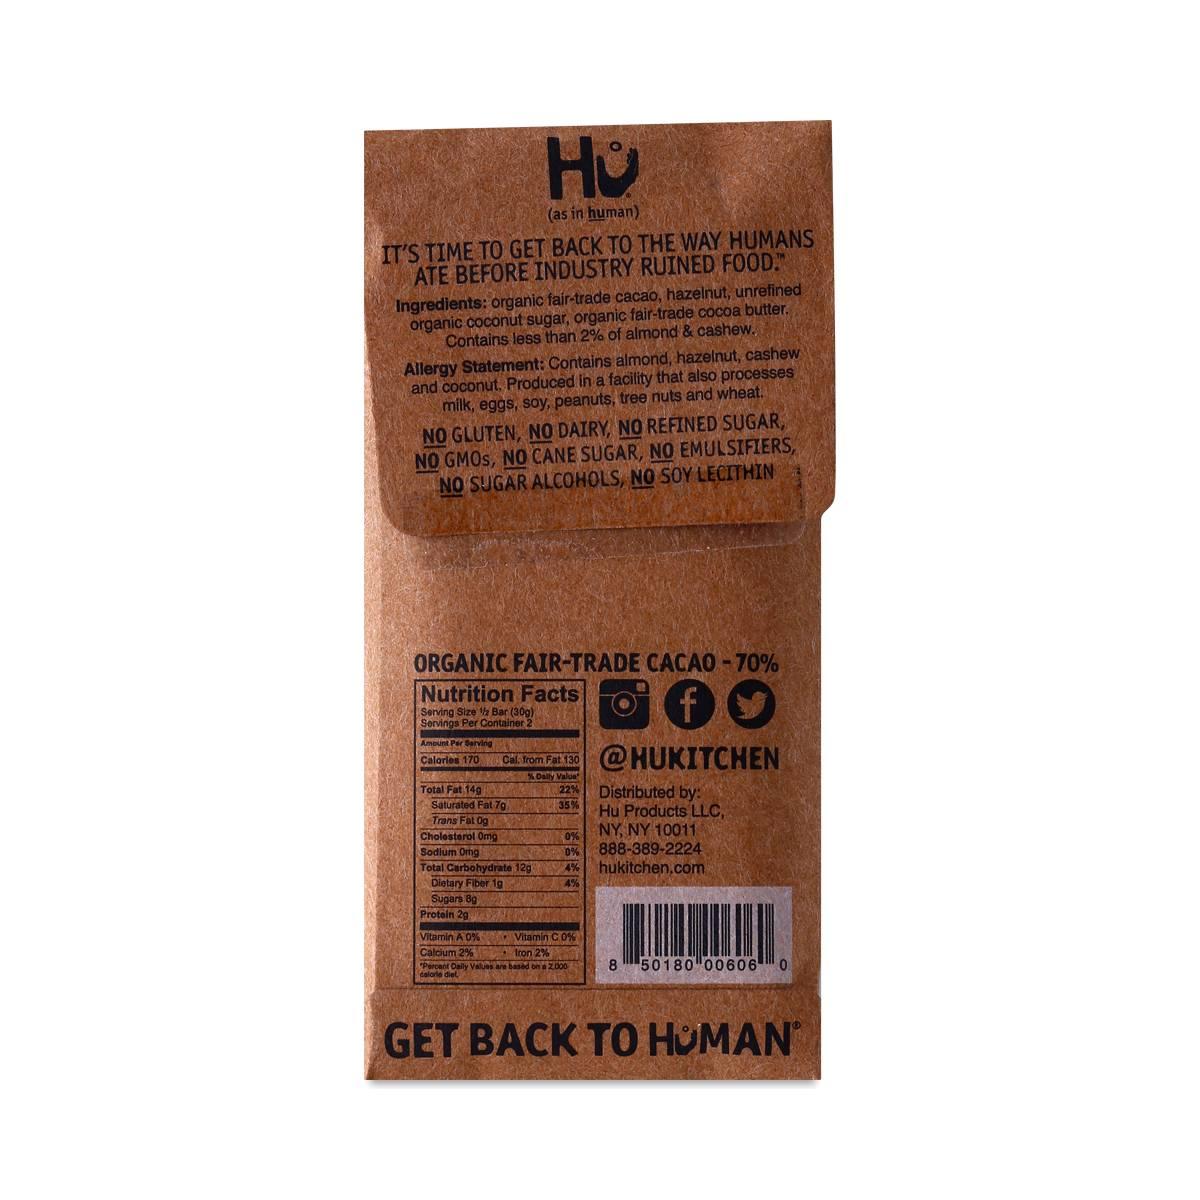 hazelnut praline chocolate barhu kitchen - thrive market